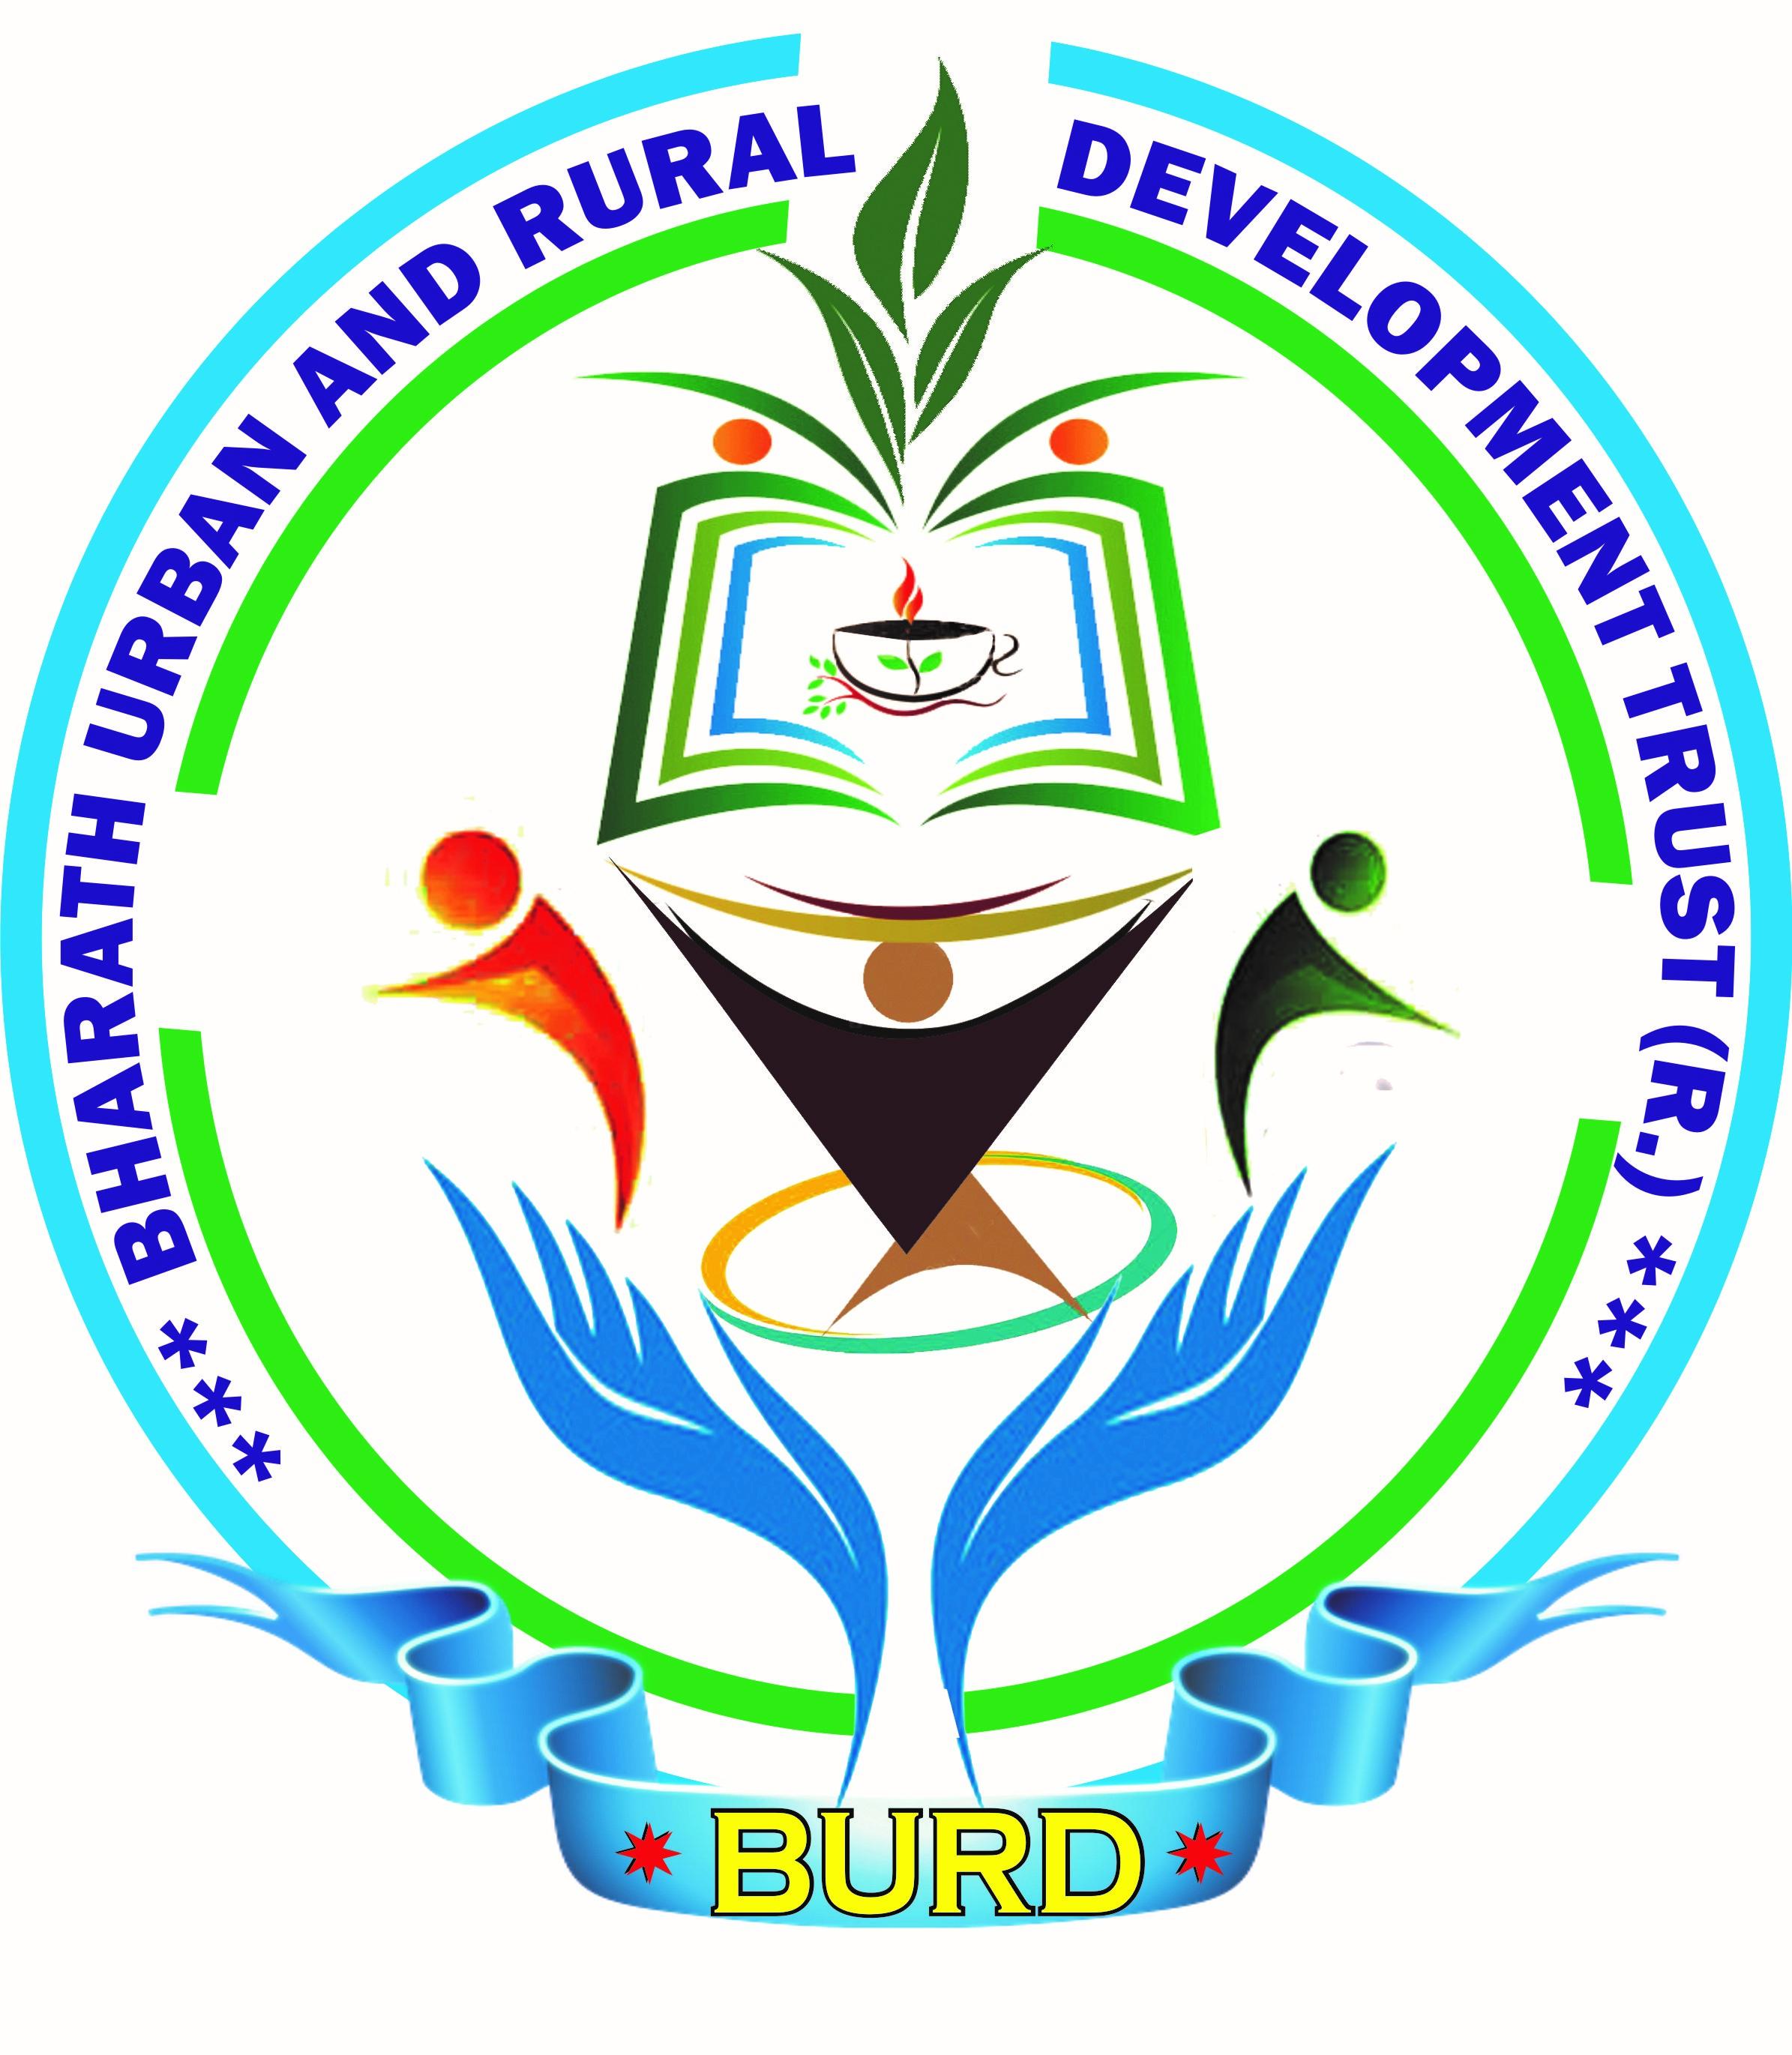 /media/burds/1NGO-00306-Bharath_Urban_And_Rural_Development_Trust-Logo.jpg